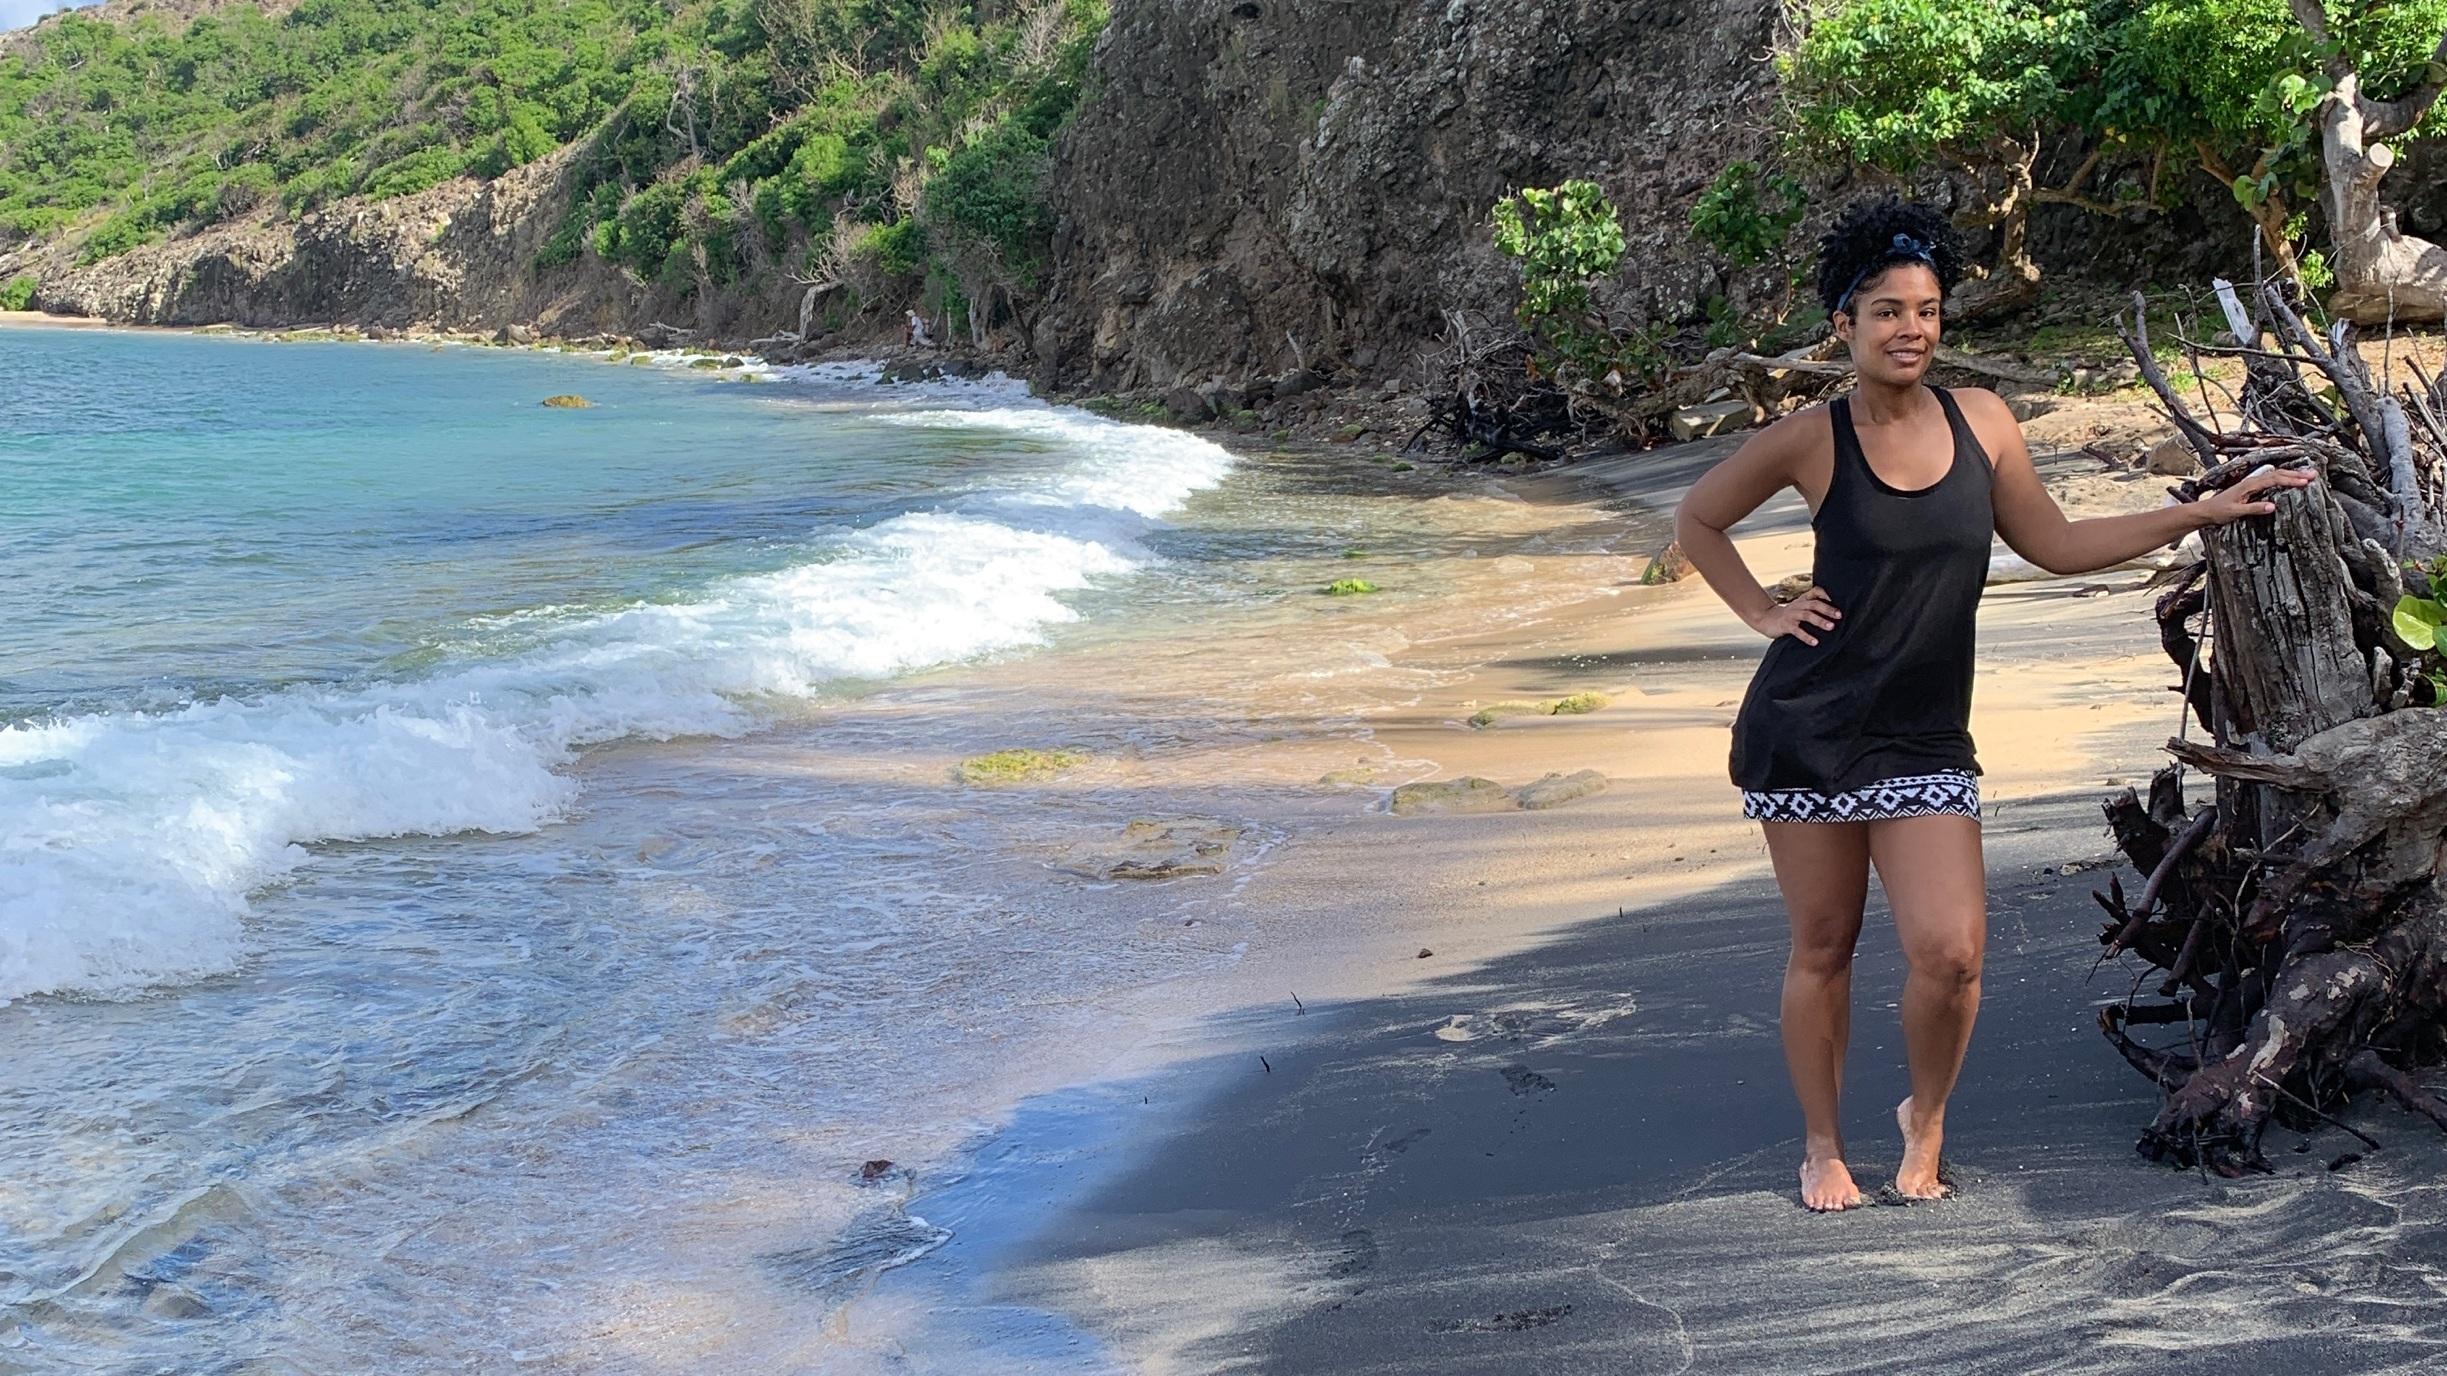 Petit Anse Beach in Guadeloupe